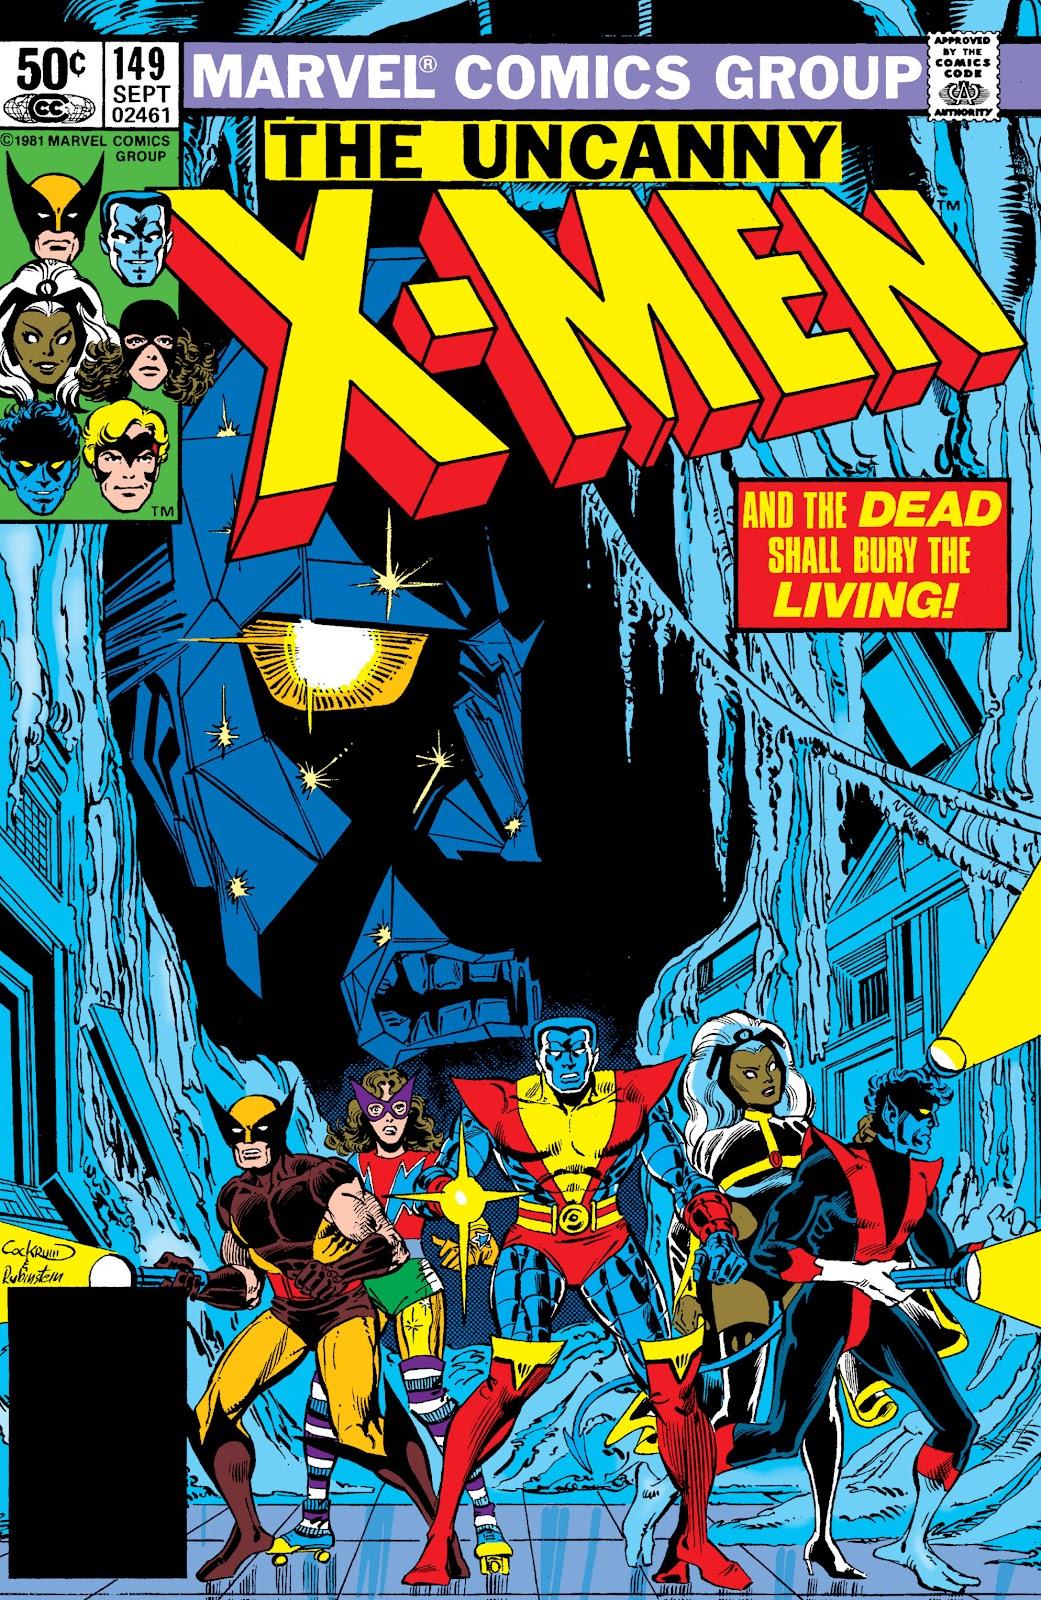 Uncanny X-Men (1963) issue 149 - Page 1